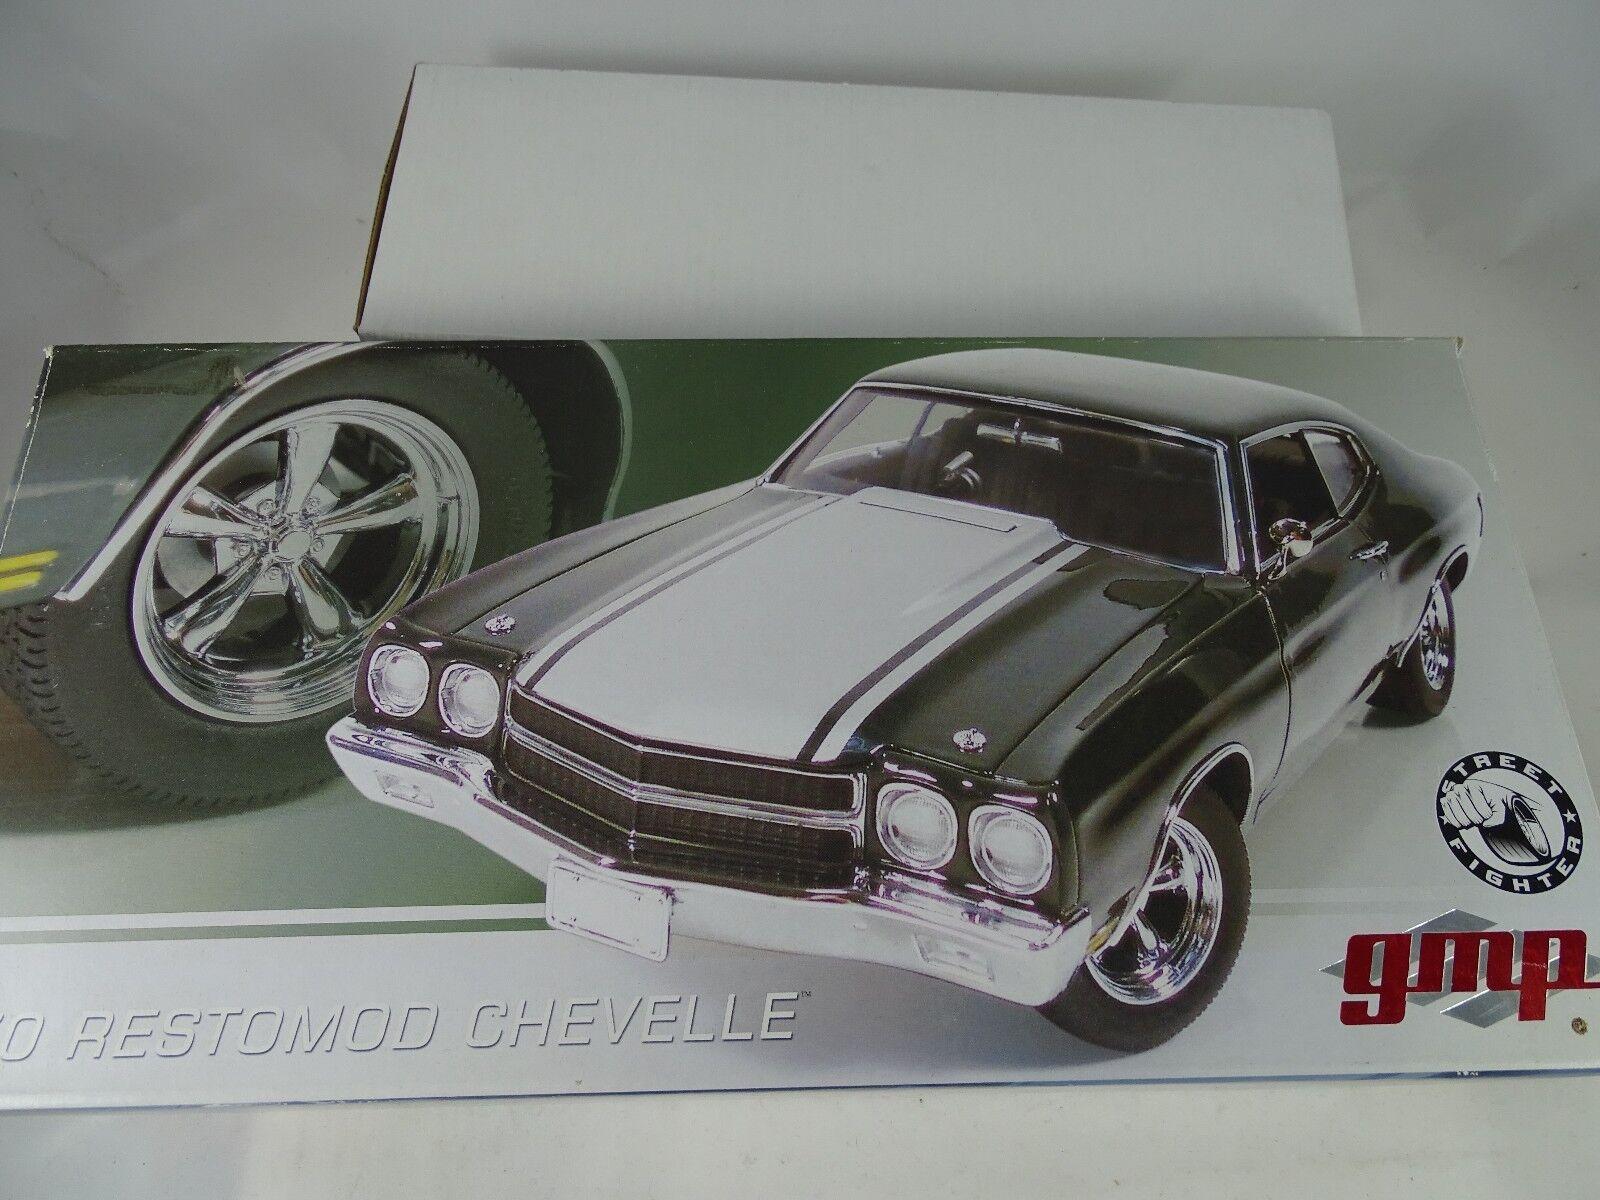 1:18 GMP  g1804301 1970 restomod Chevelle verde Lmtd. ed. 1/1000 - rarità §